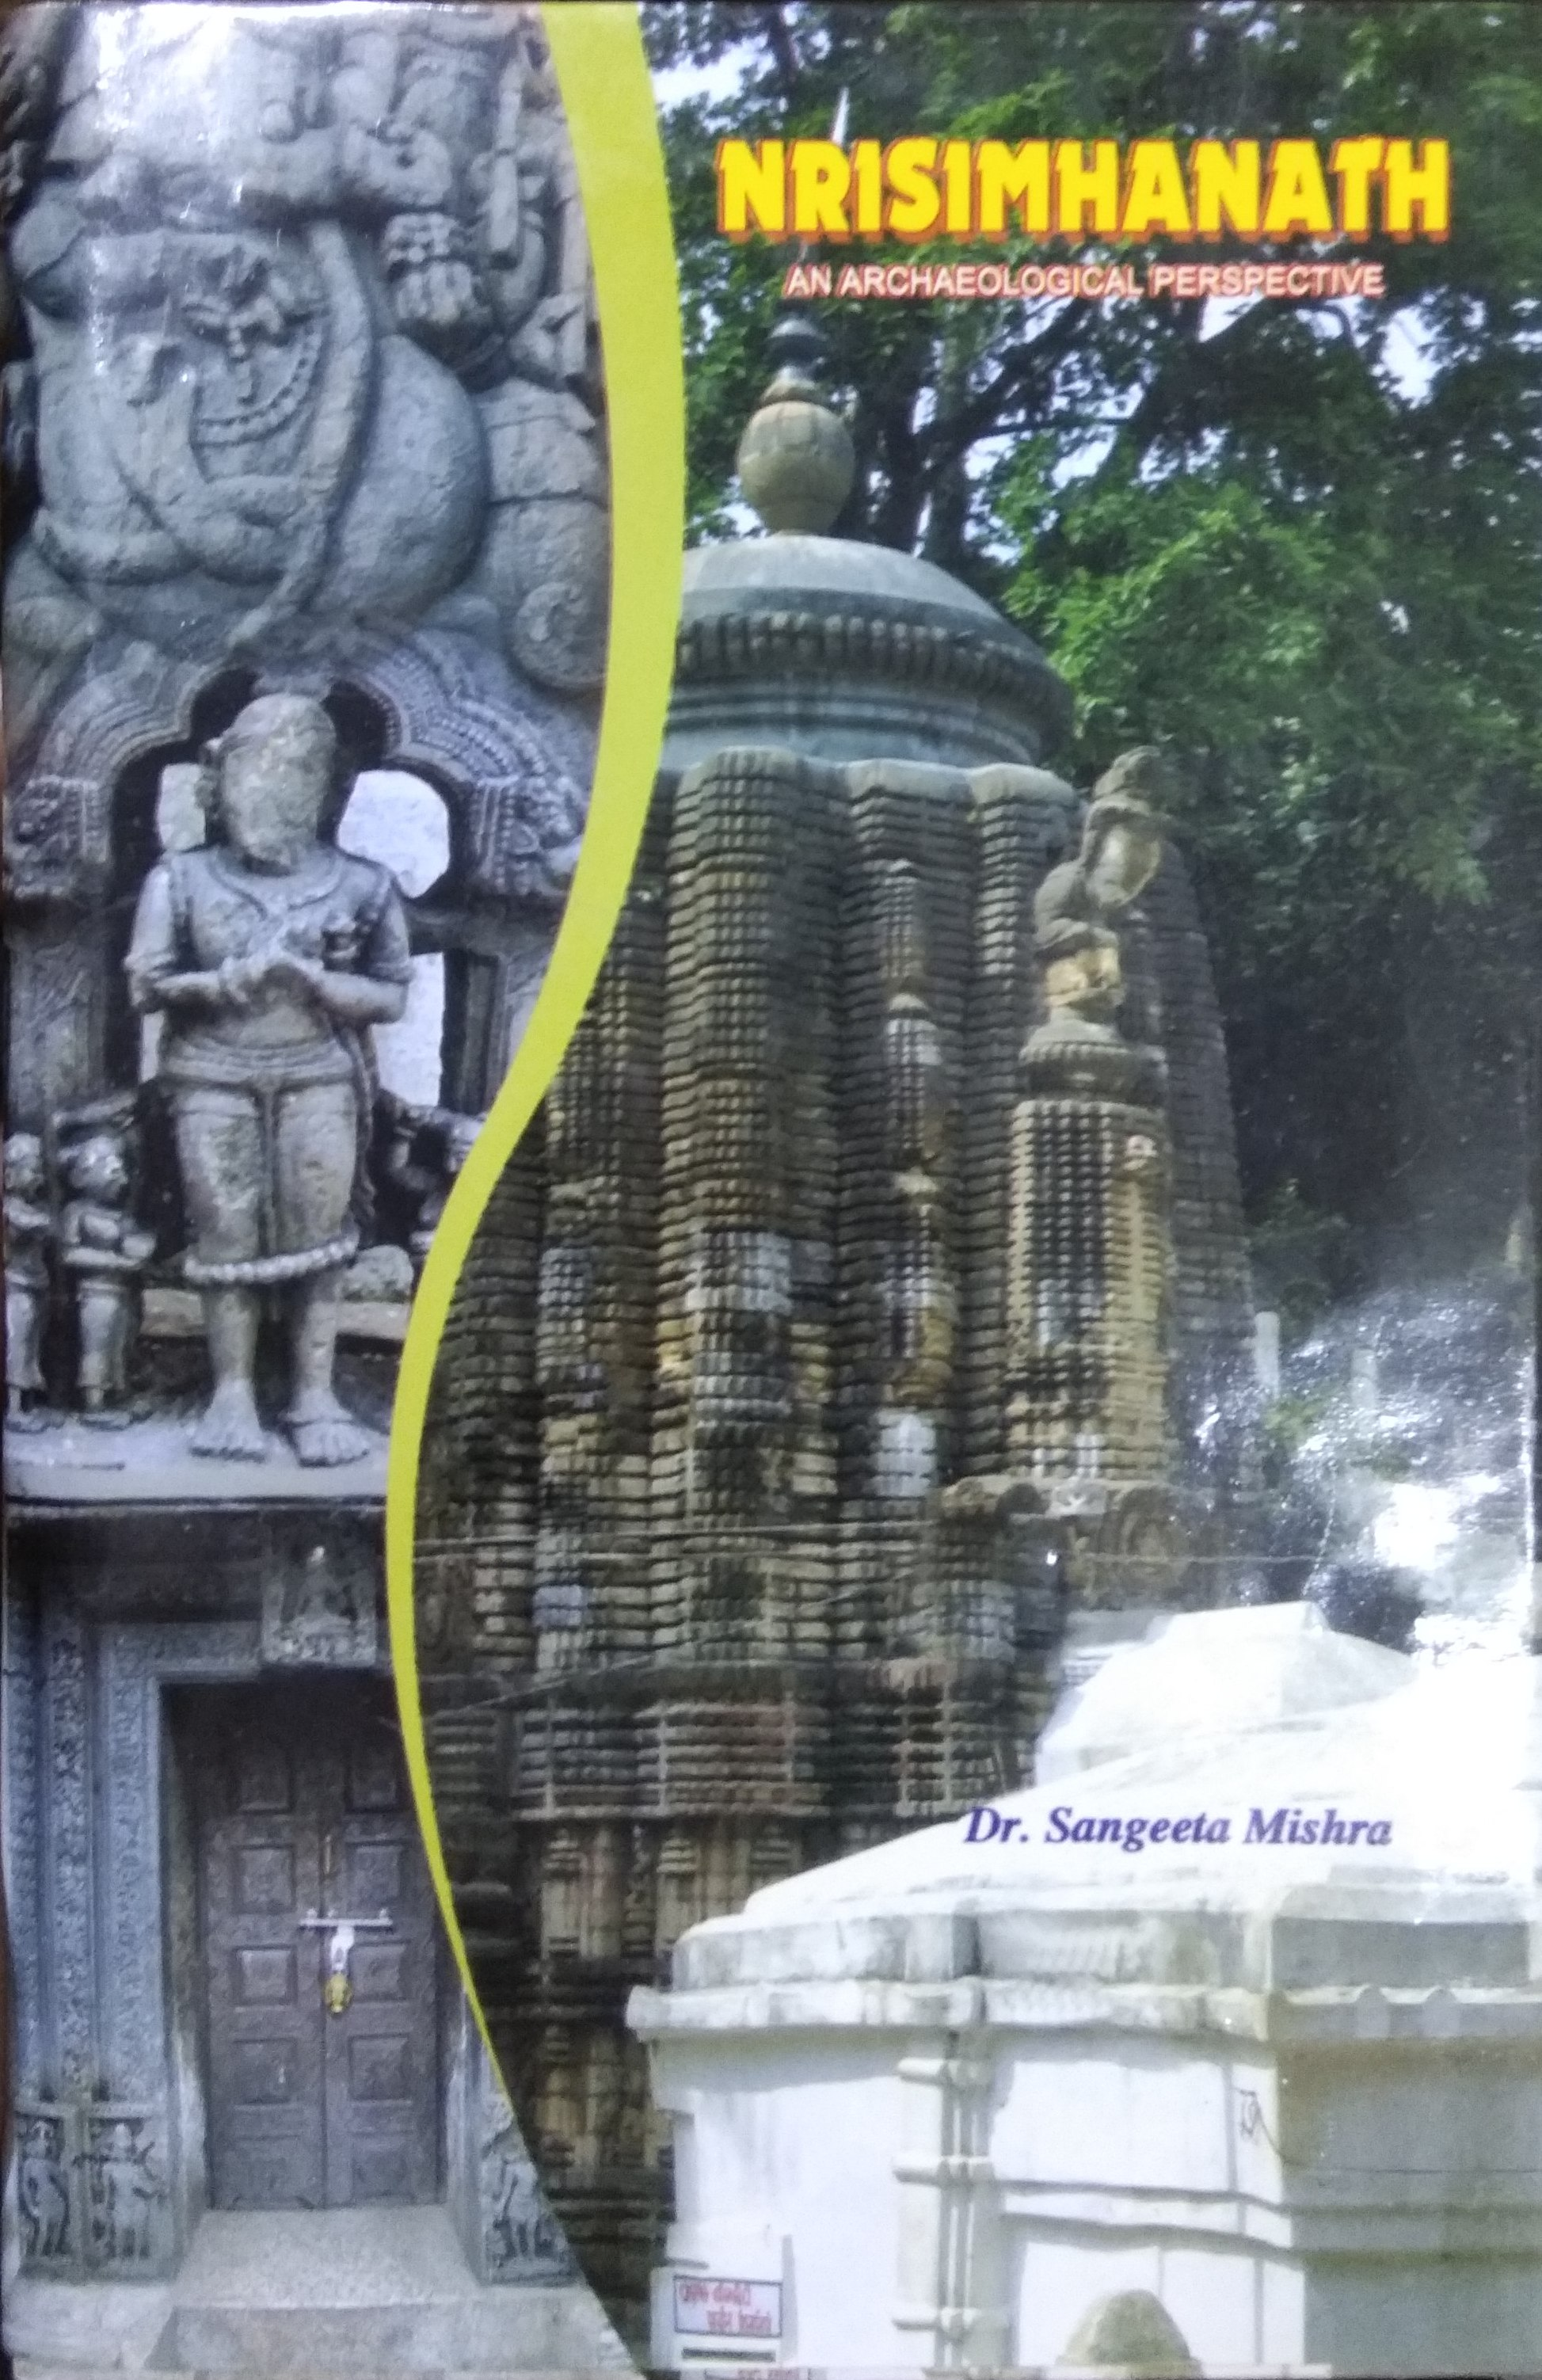 Nrisimhanath: An Archaeological Perspective